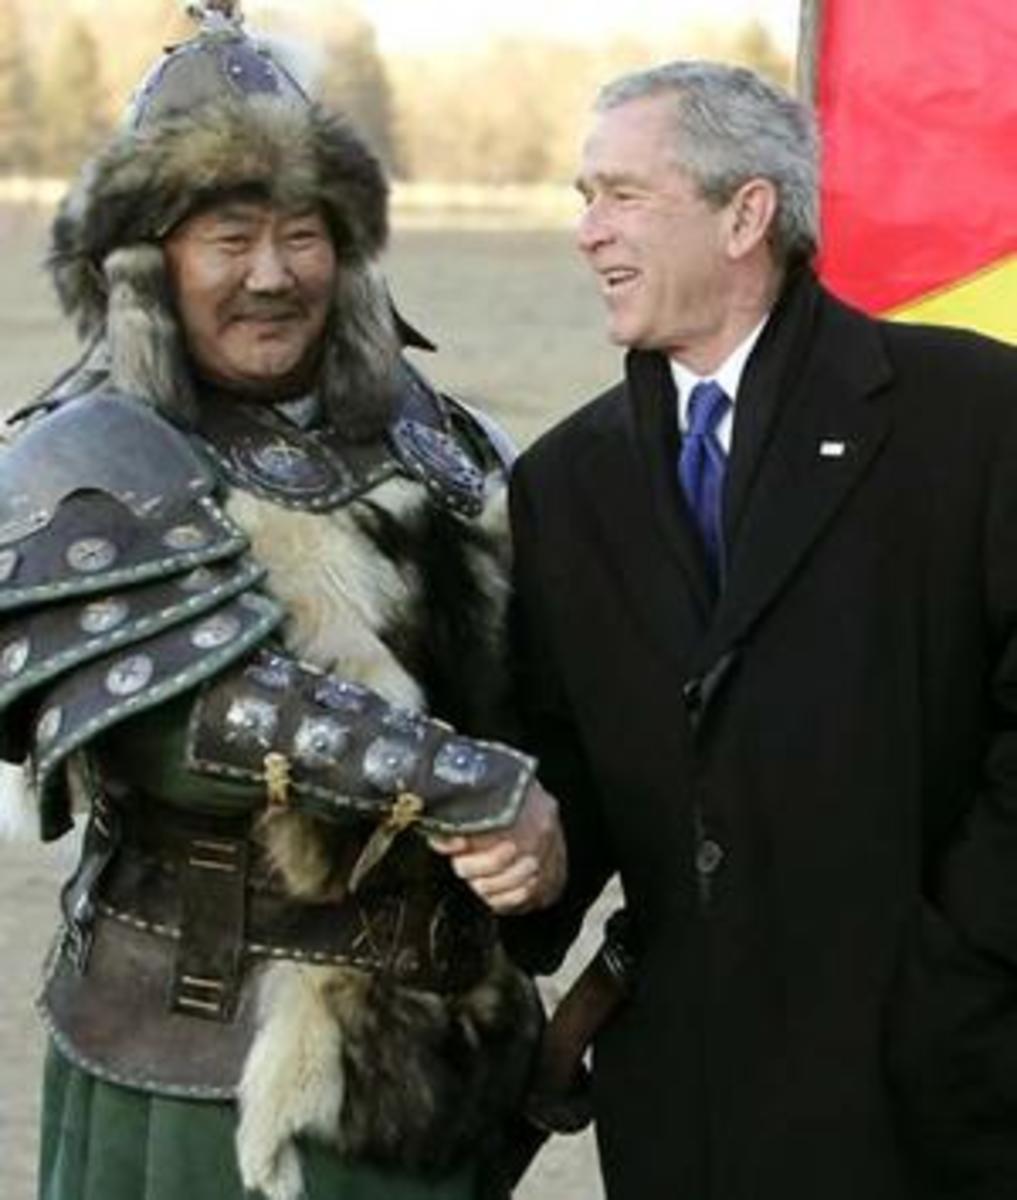 Genghis Khan and George Bush